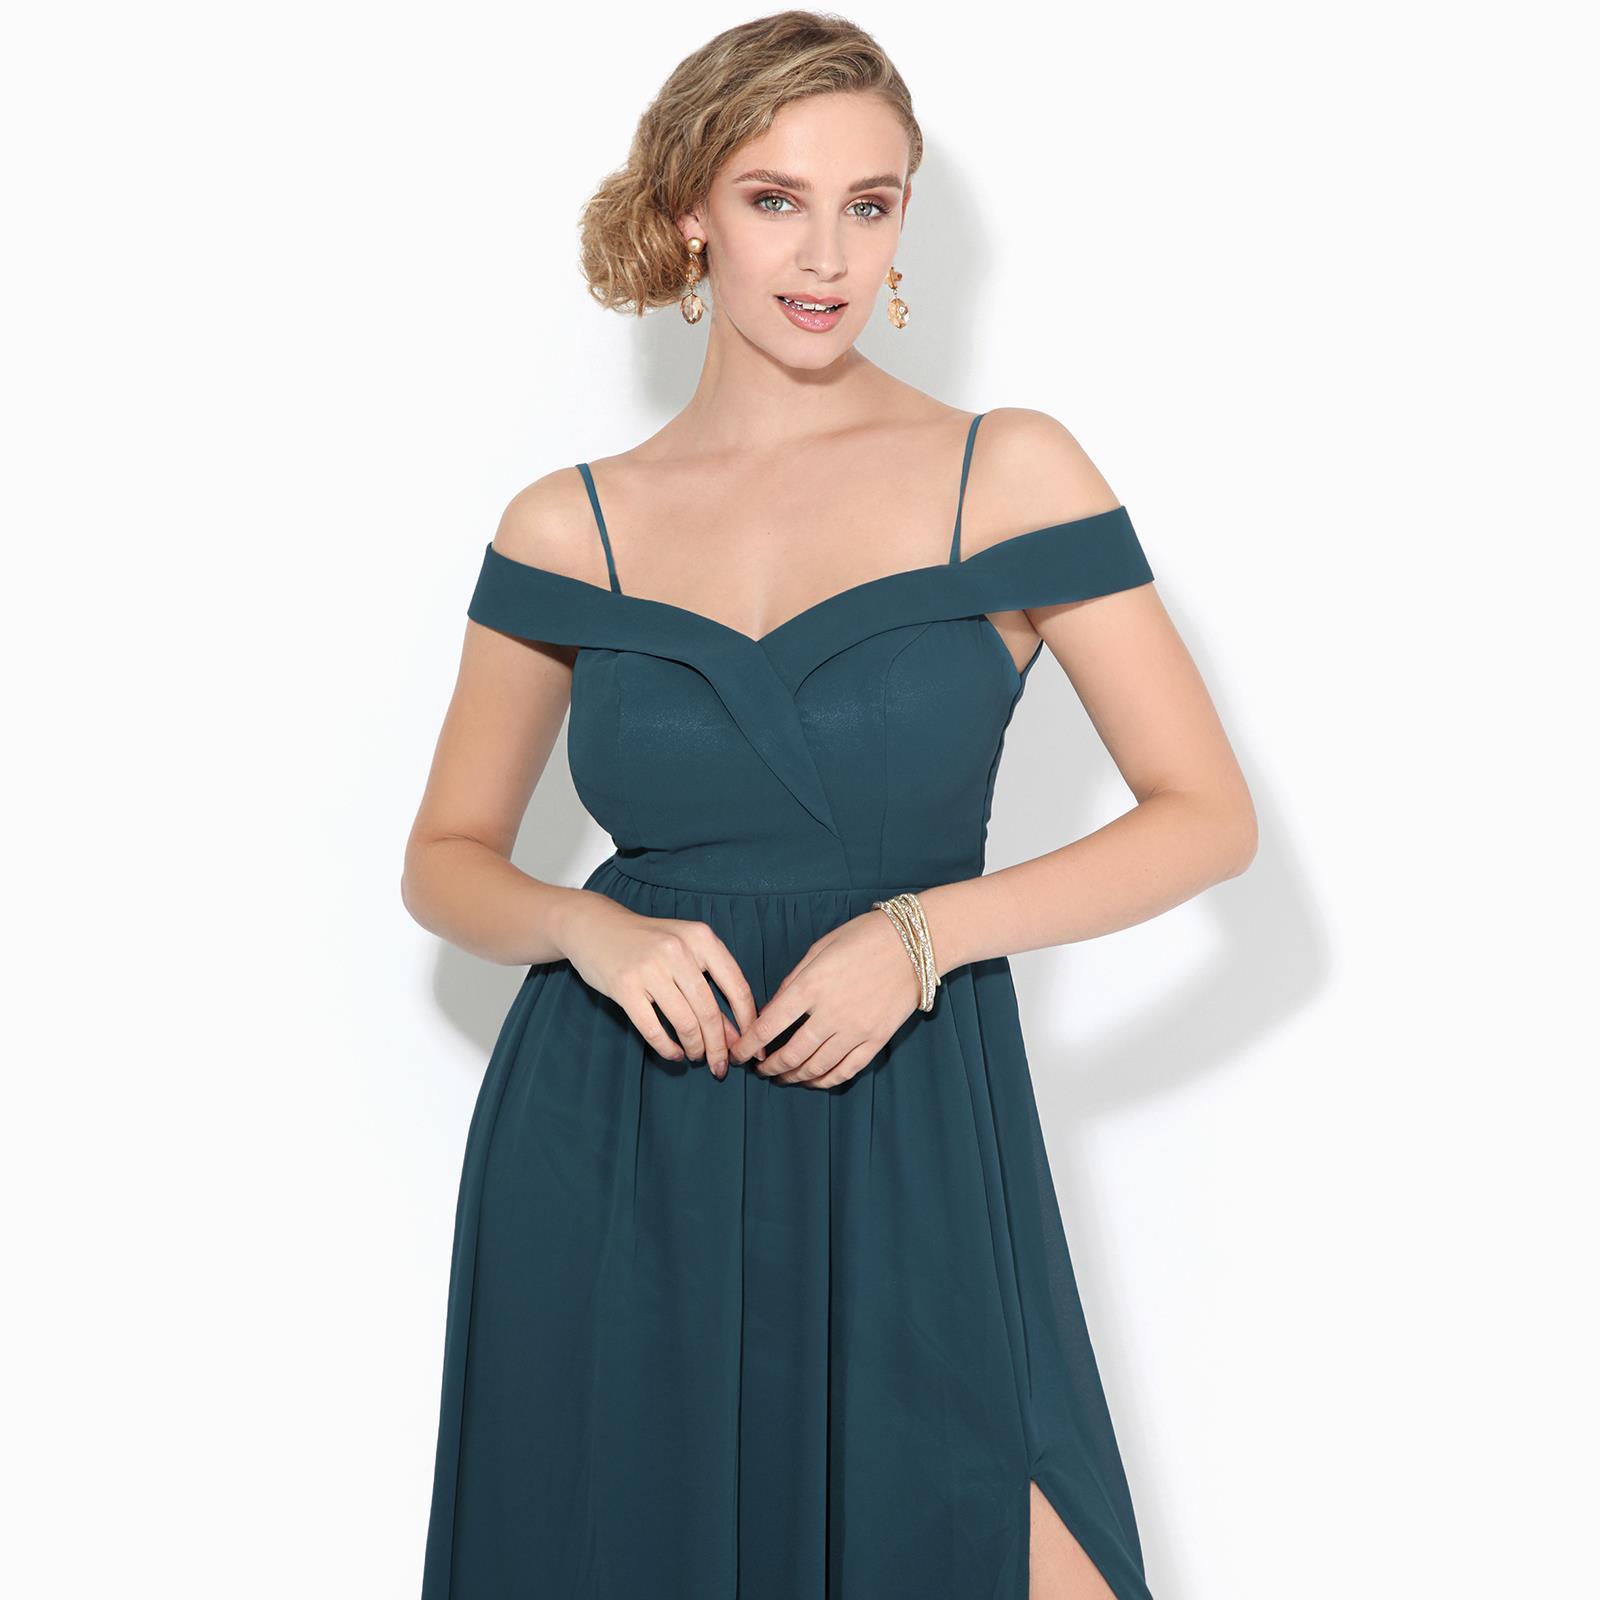 Womens-Ladies-Off-Shoulder-Formal-Maxi-Dress-Slit-Split-Long-Gown-Wedding-Party thumbnail 12